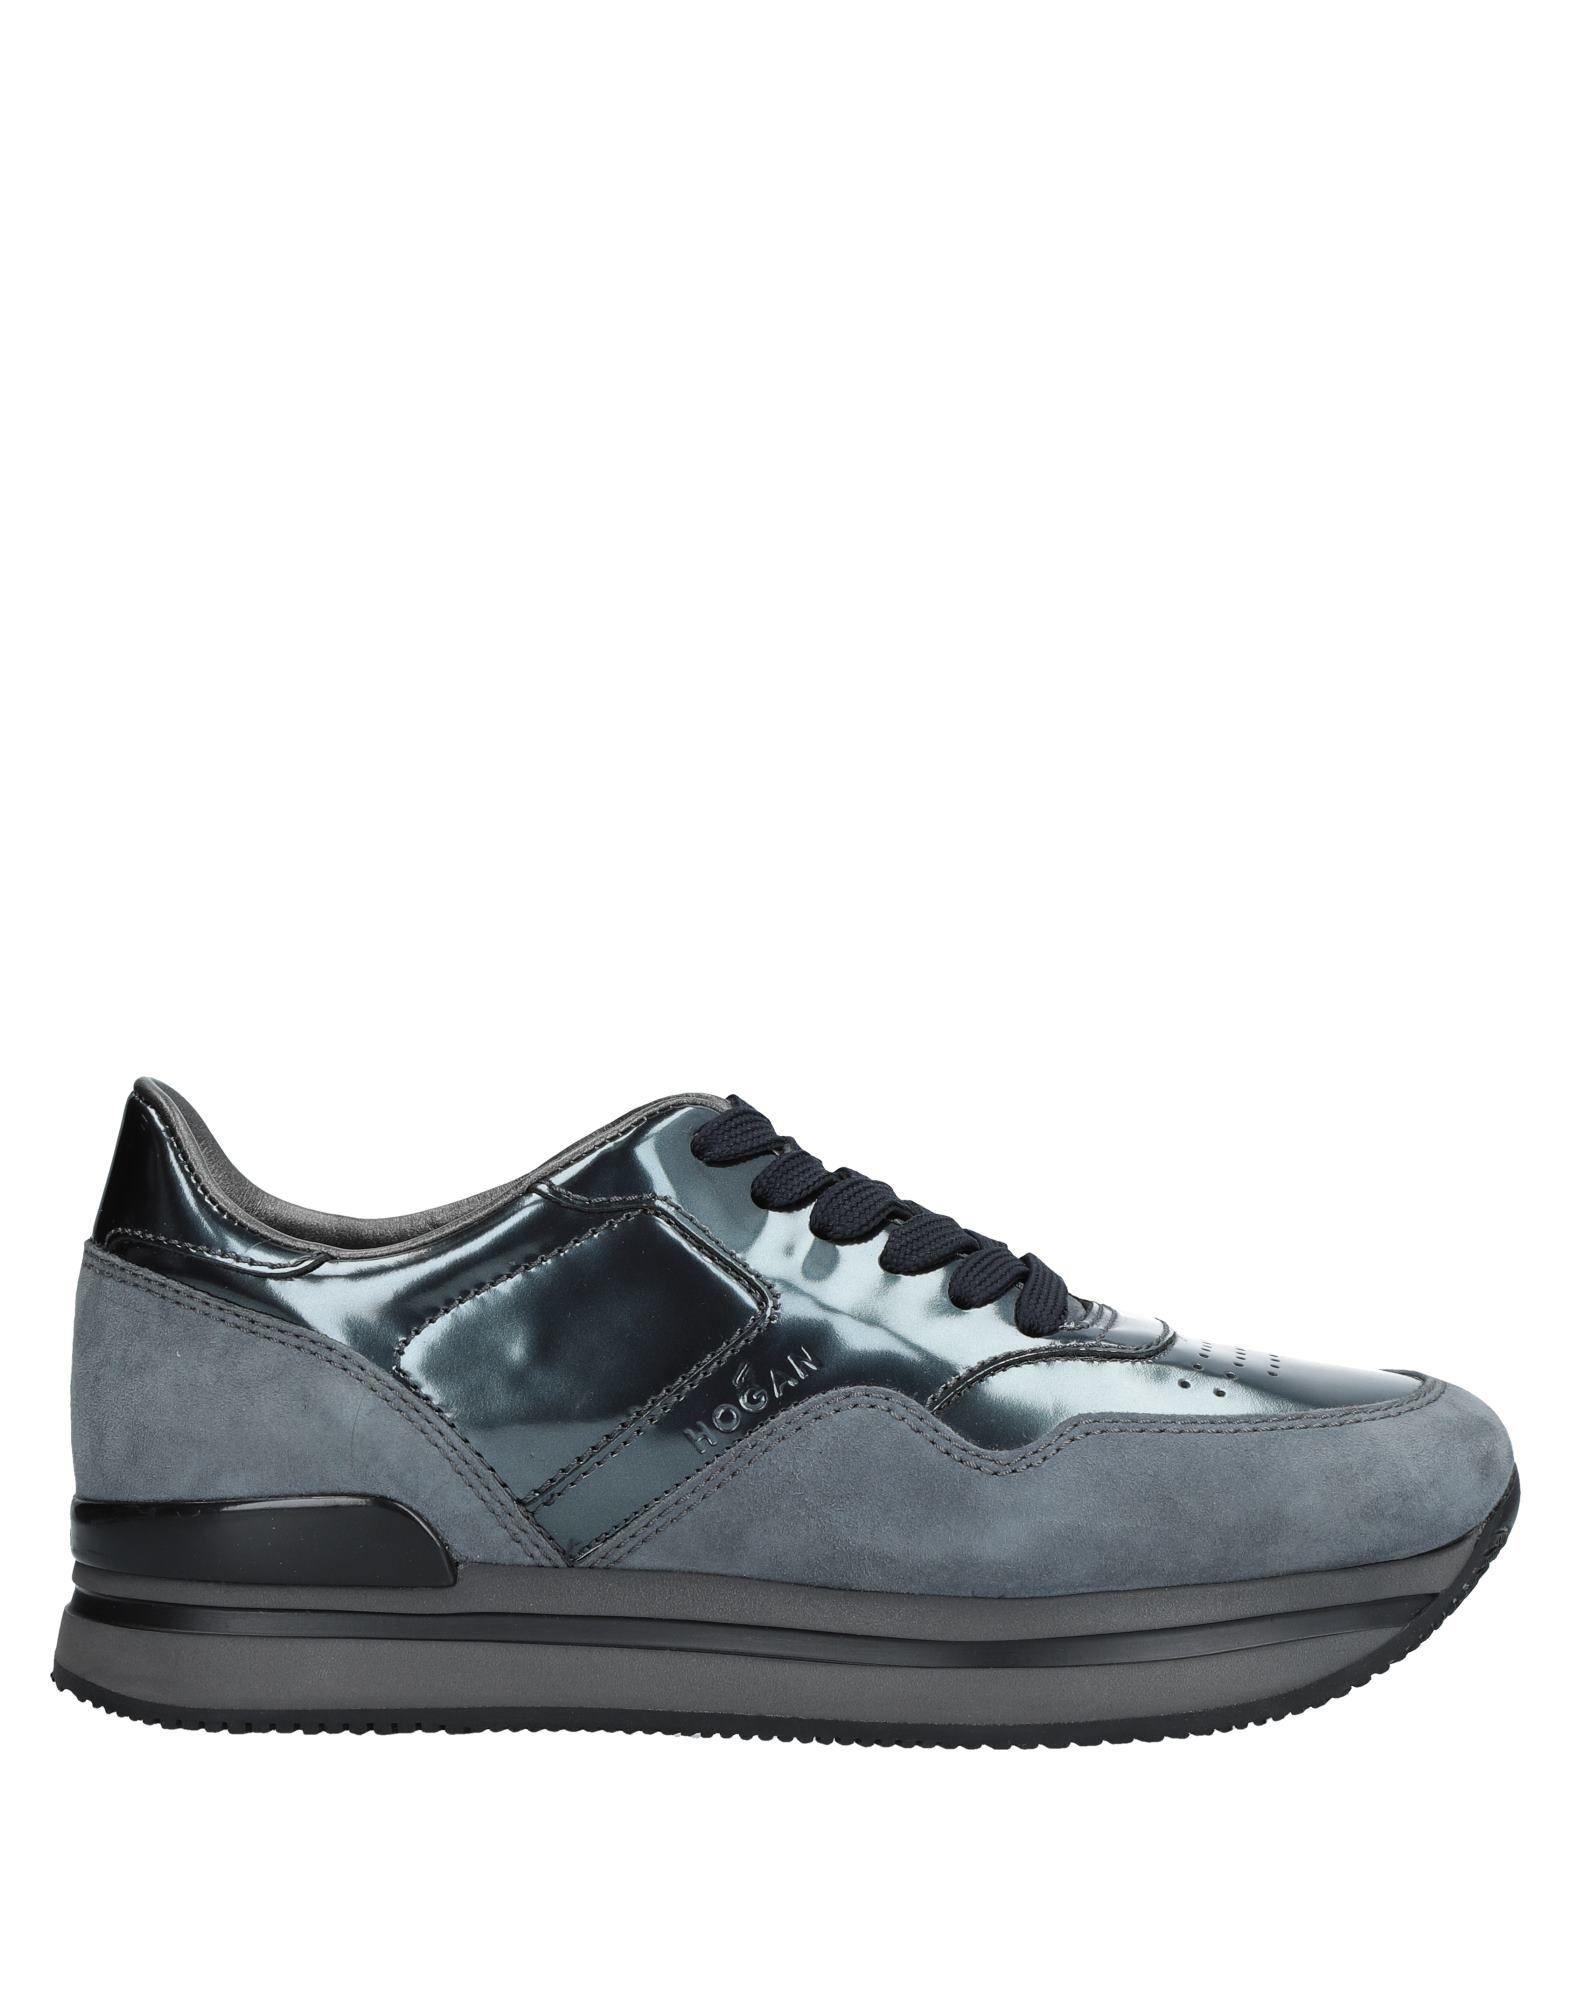 Moda Sneakers Hogan Donna - 11299155KM